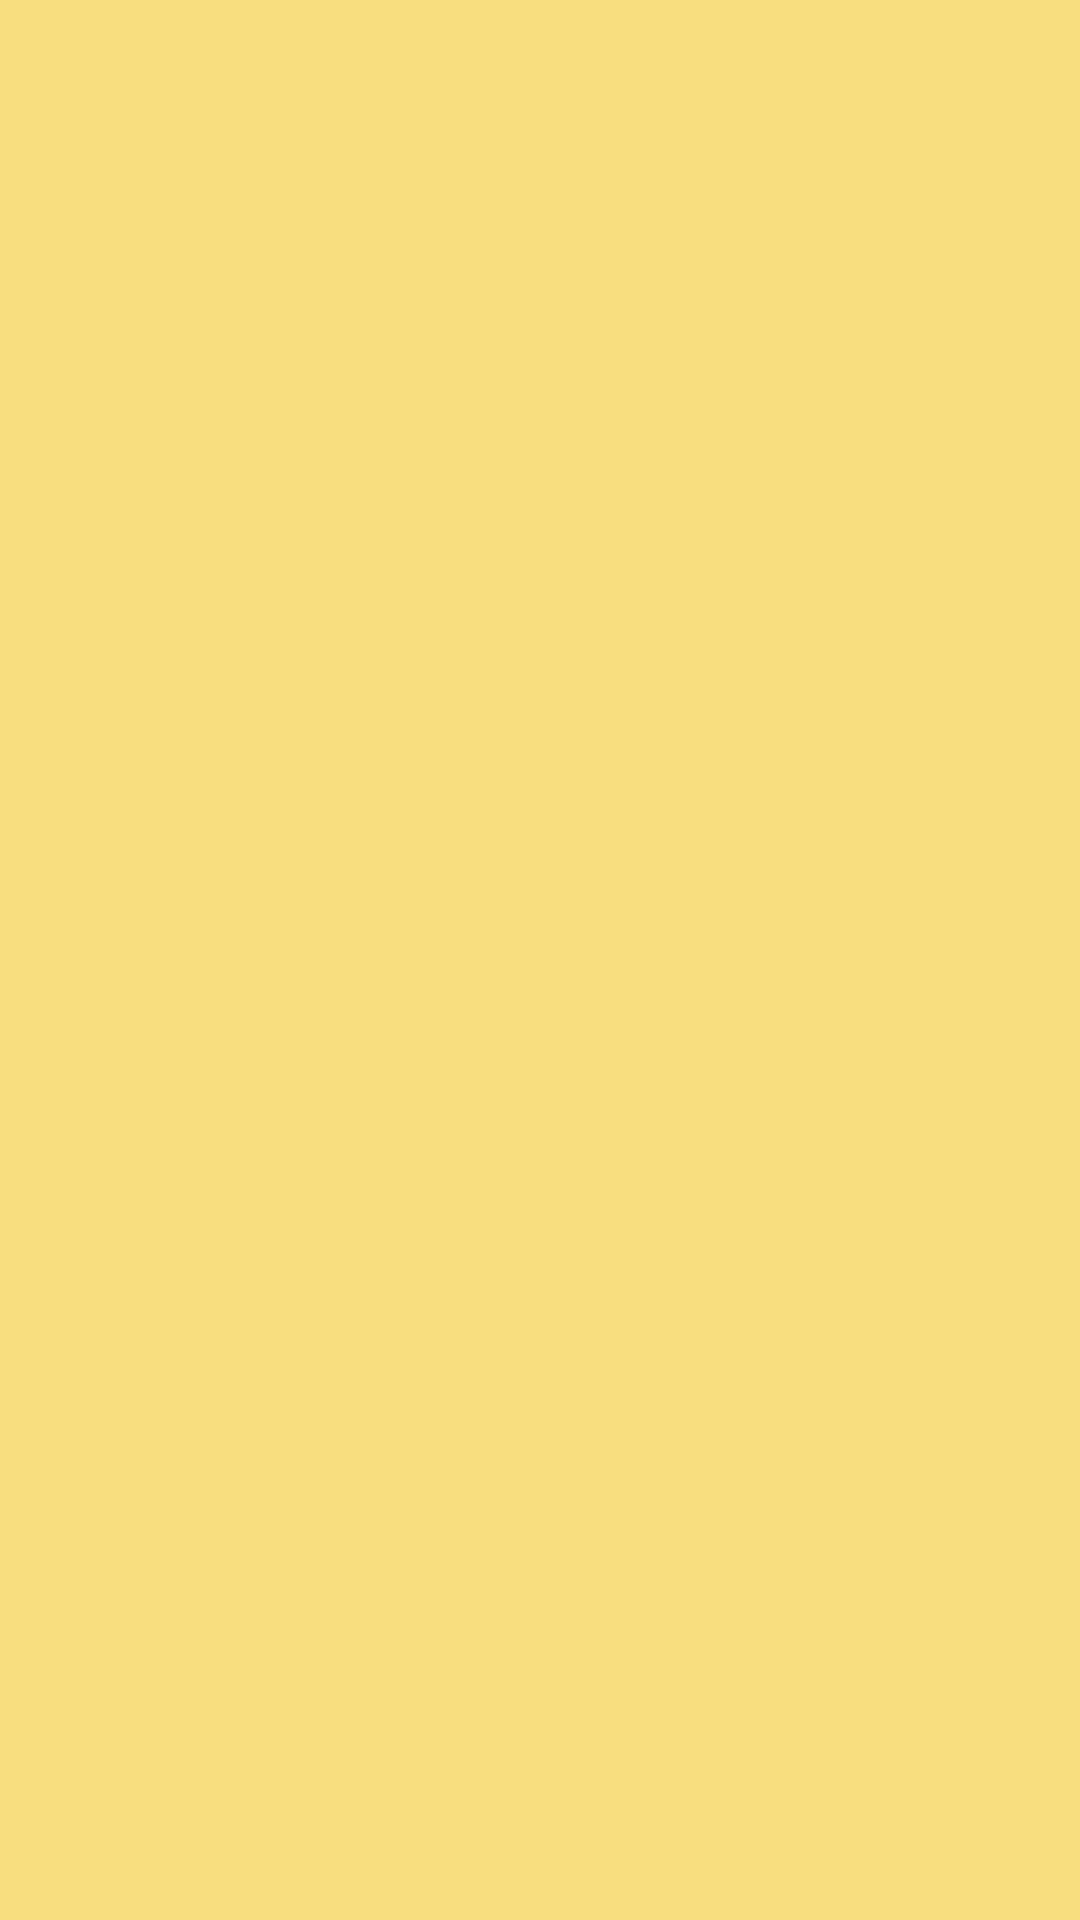 1080x1920 Jasmine Solid Color Background